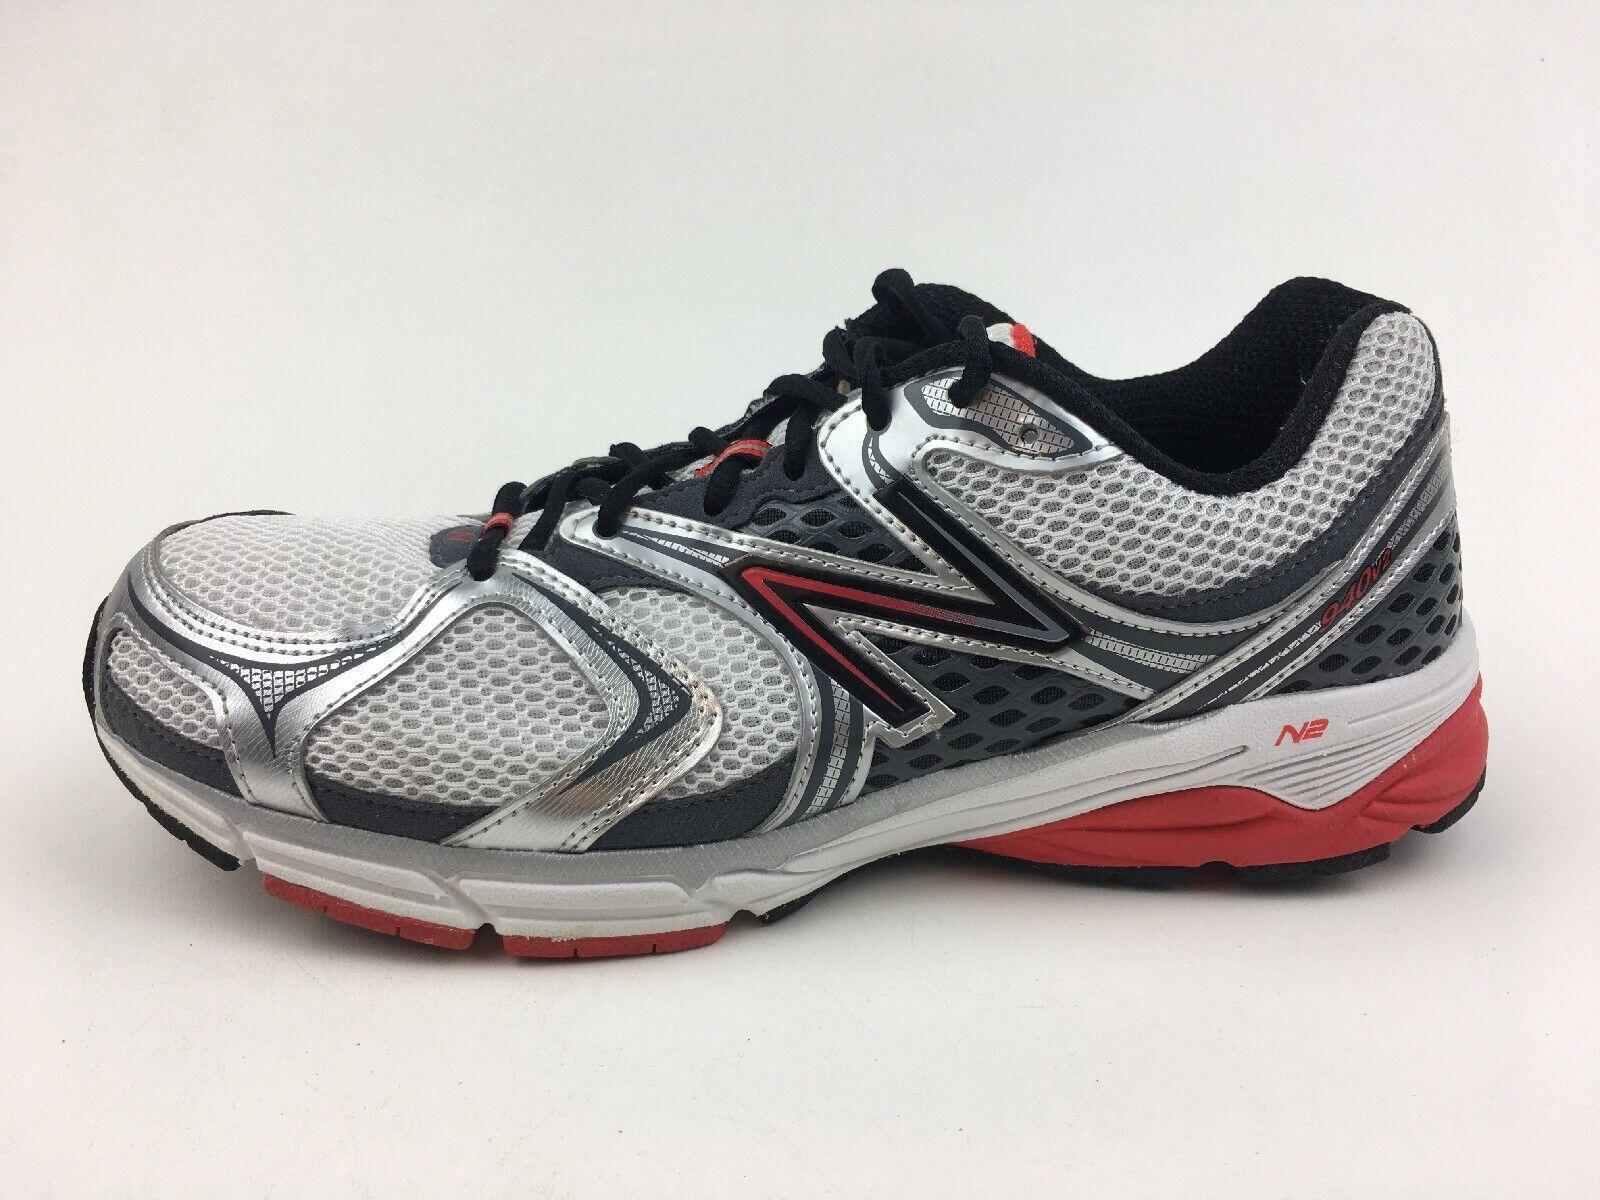 Para hombres M940SR2 Running Zapatos Talla New Balance 10D, gris Plata 2345